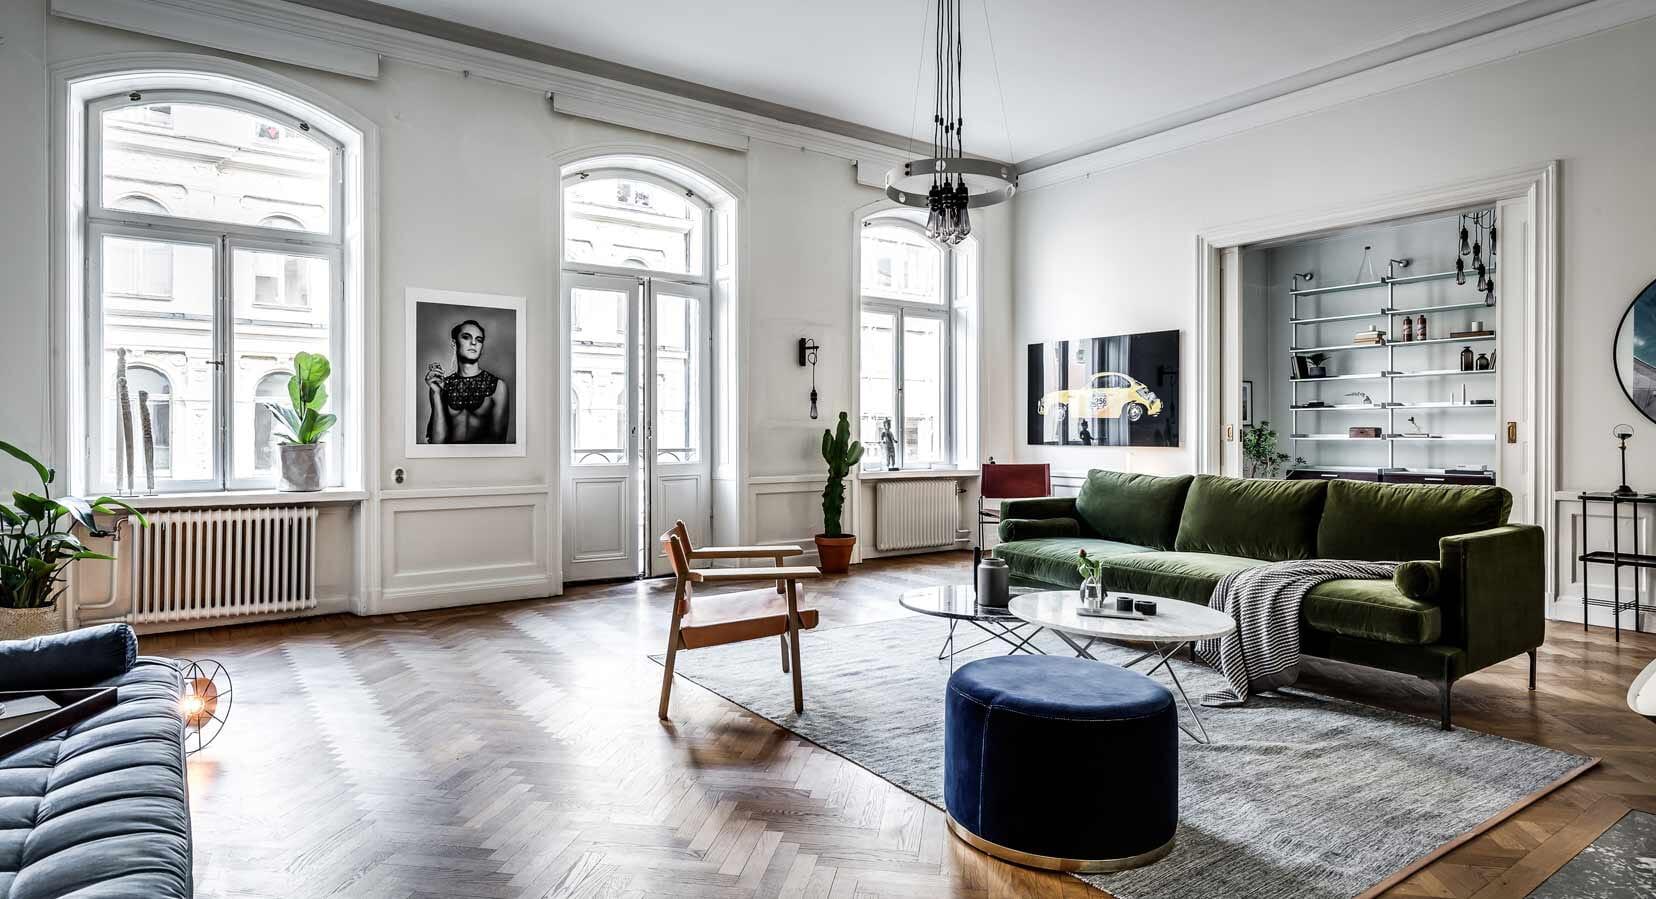 Take A Look Inside Styrmansgatan 5 By Henrik Nero